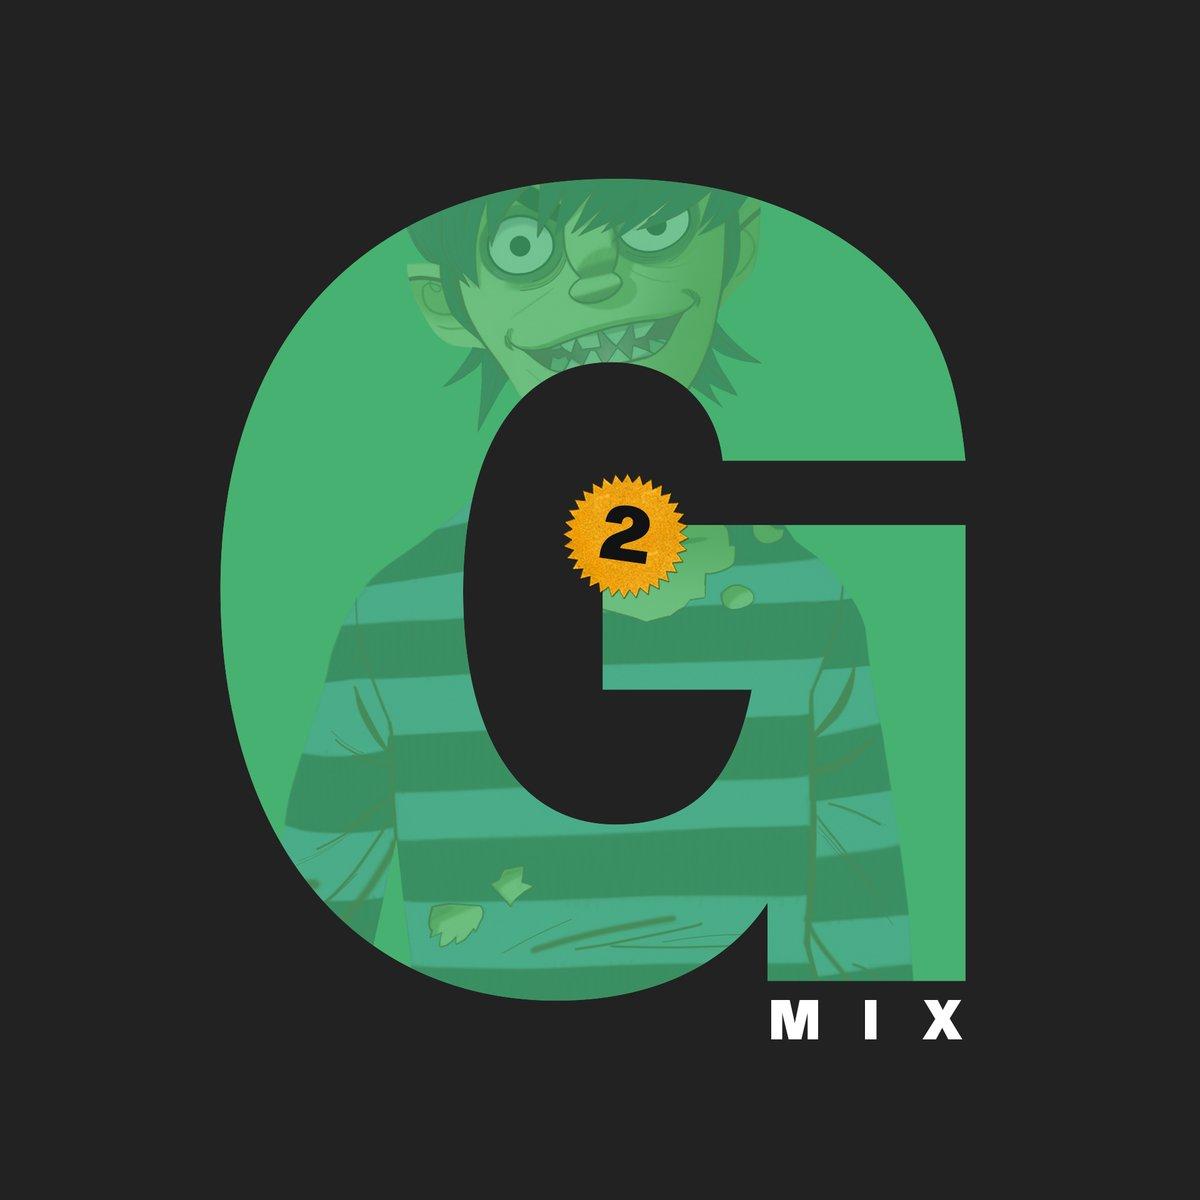 G-Mix: Murdoc 2